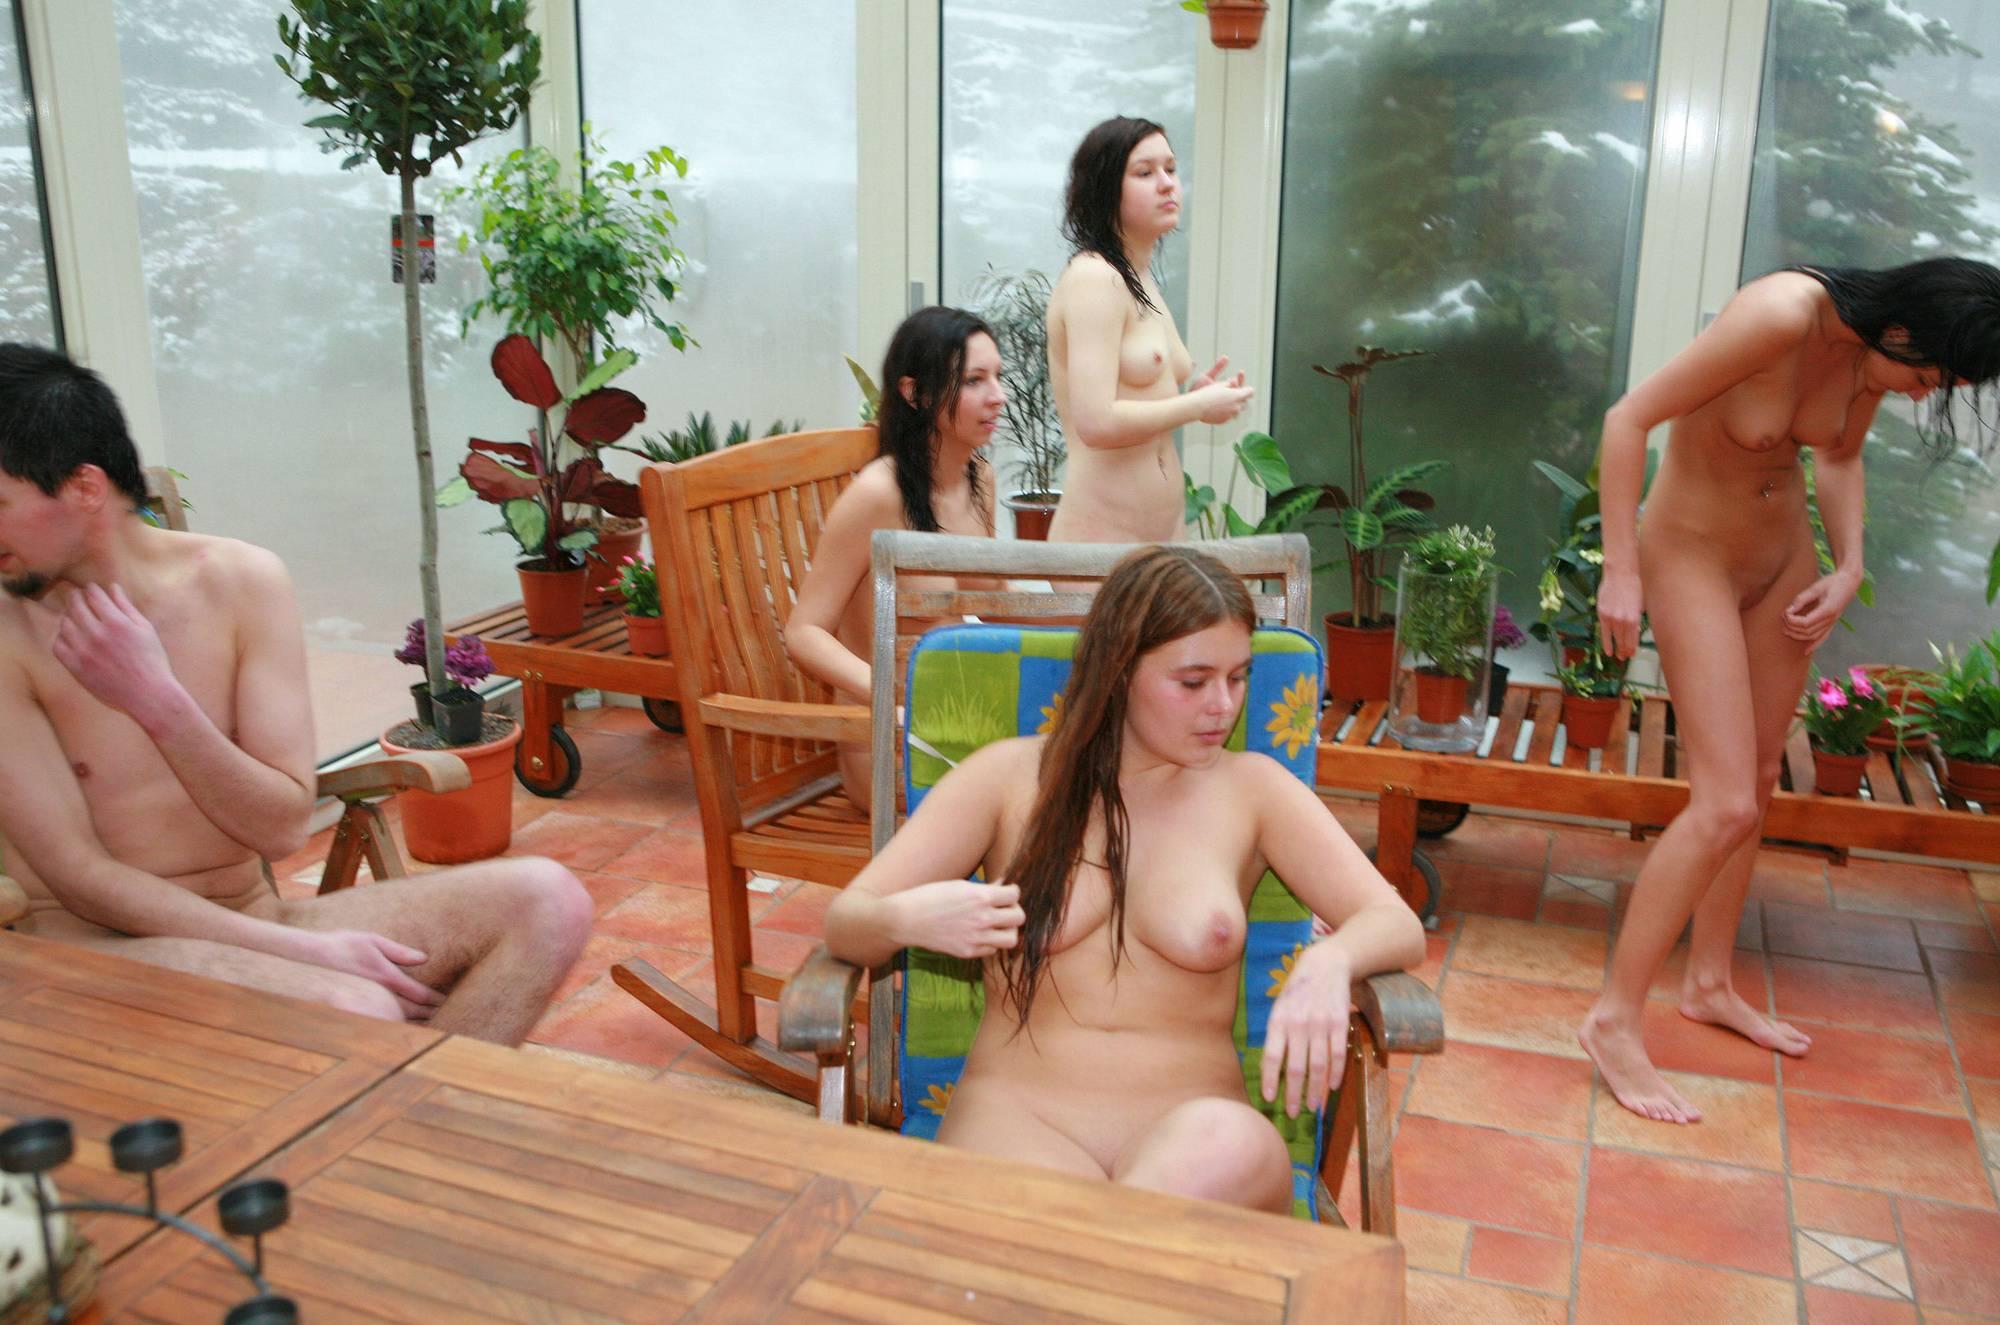 Nudist Gallery Girls' Pool Party Solarium - 1